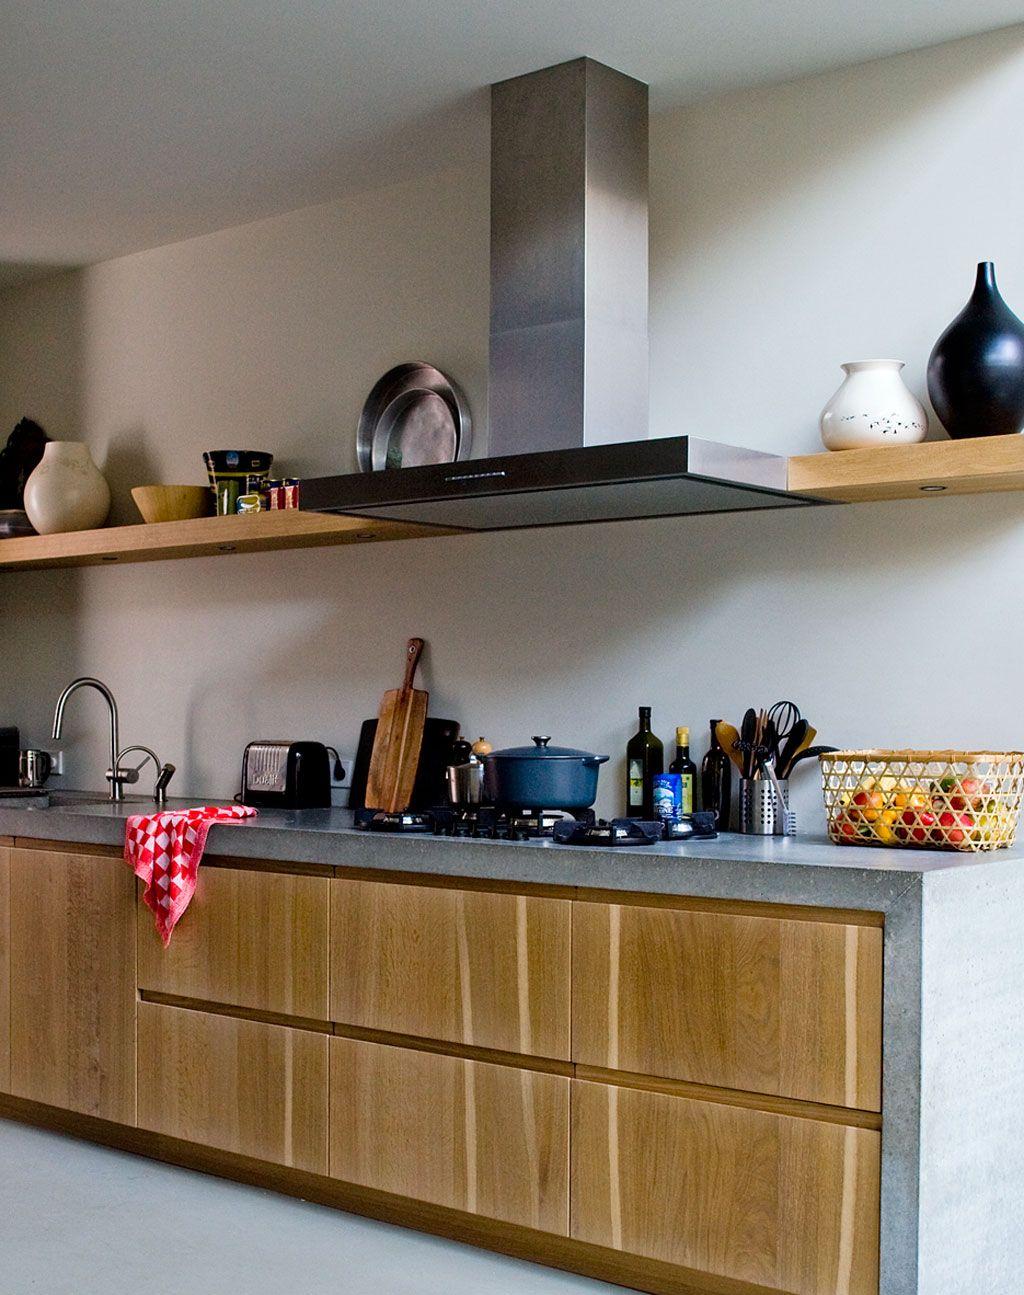 Concrete and wood  Kitchen  Pinterest  부엌, 영감 및 인테리어